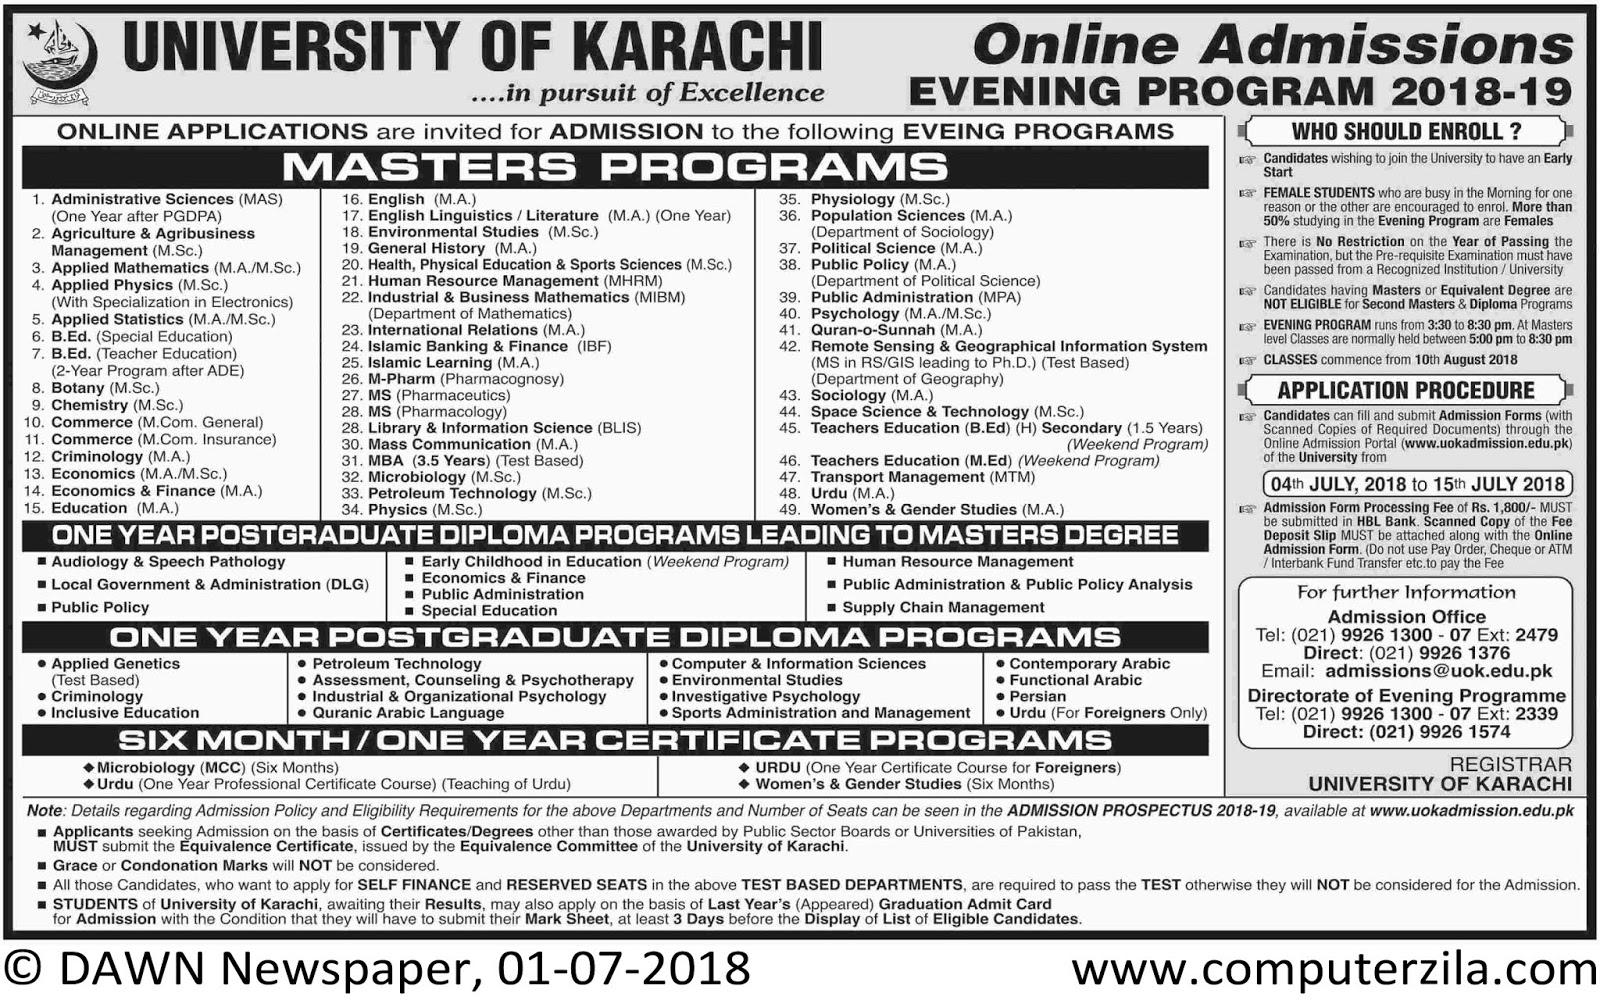 University of Karachi Admissions Fall 2018